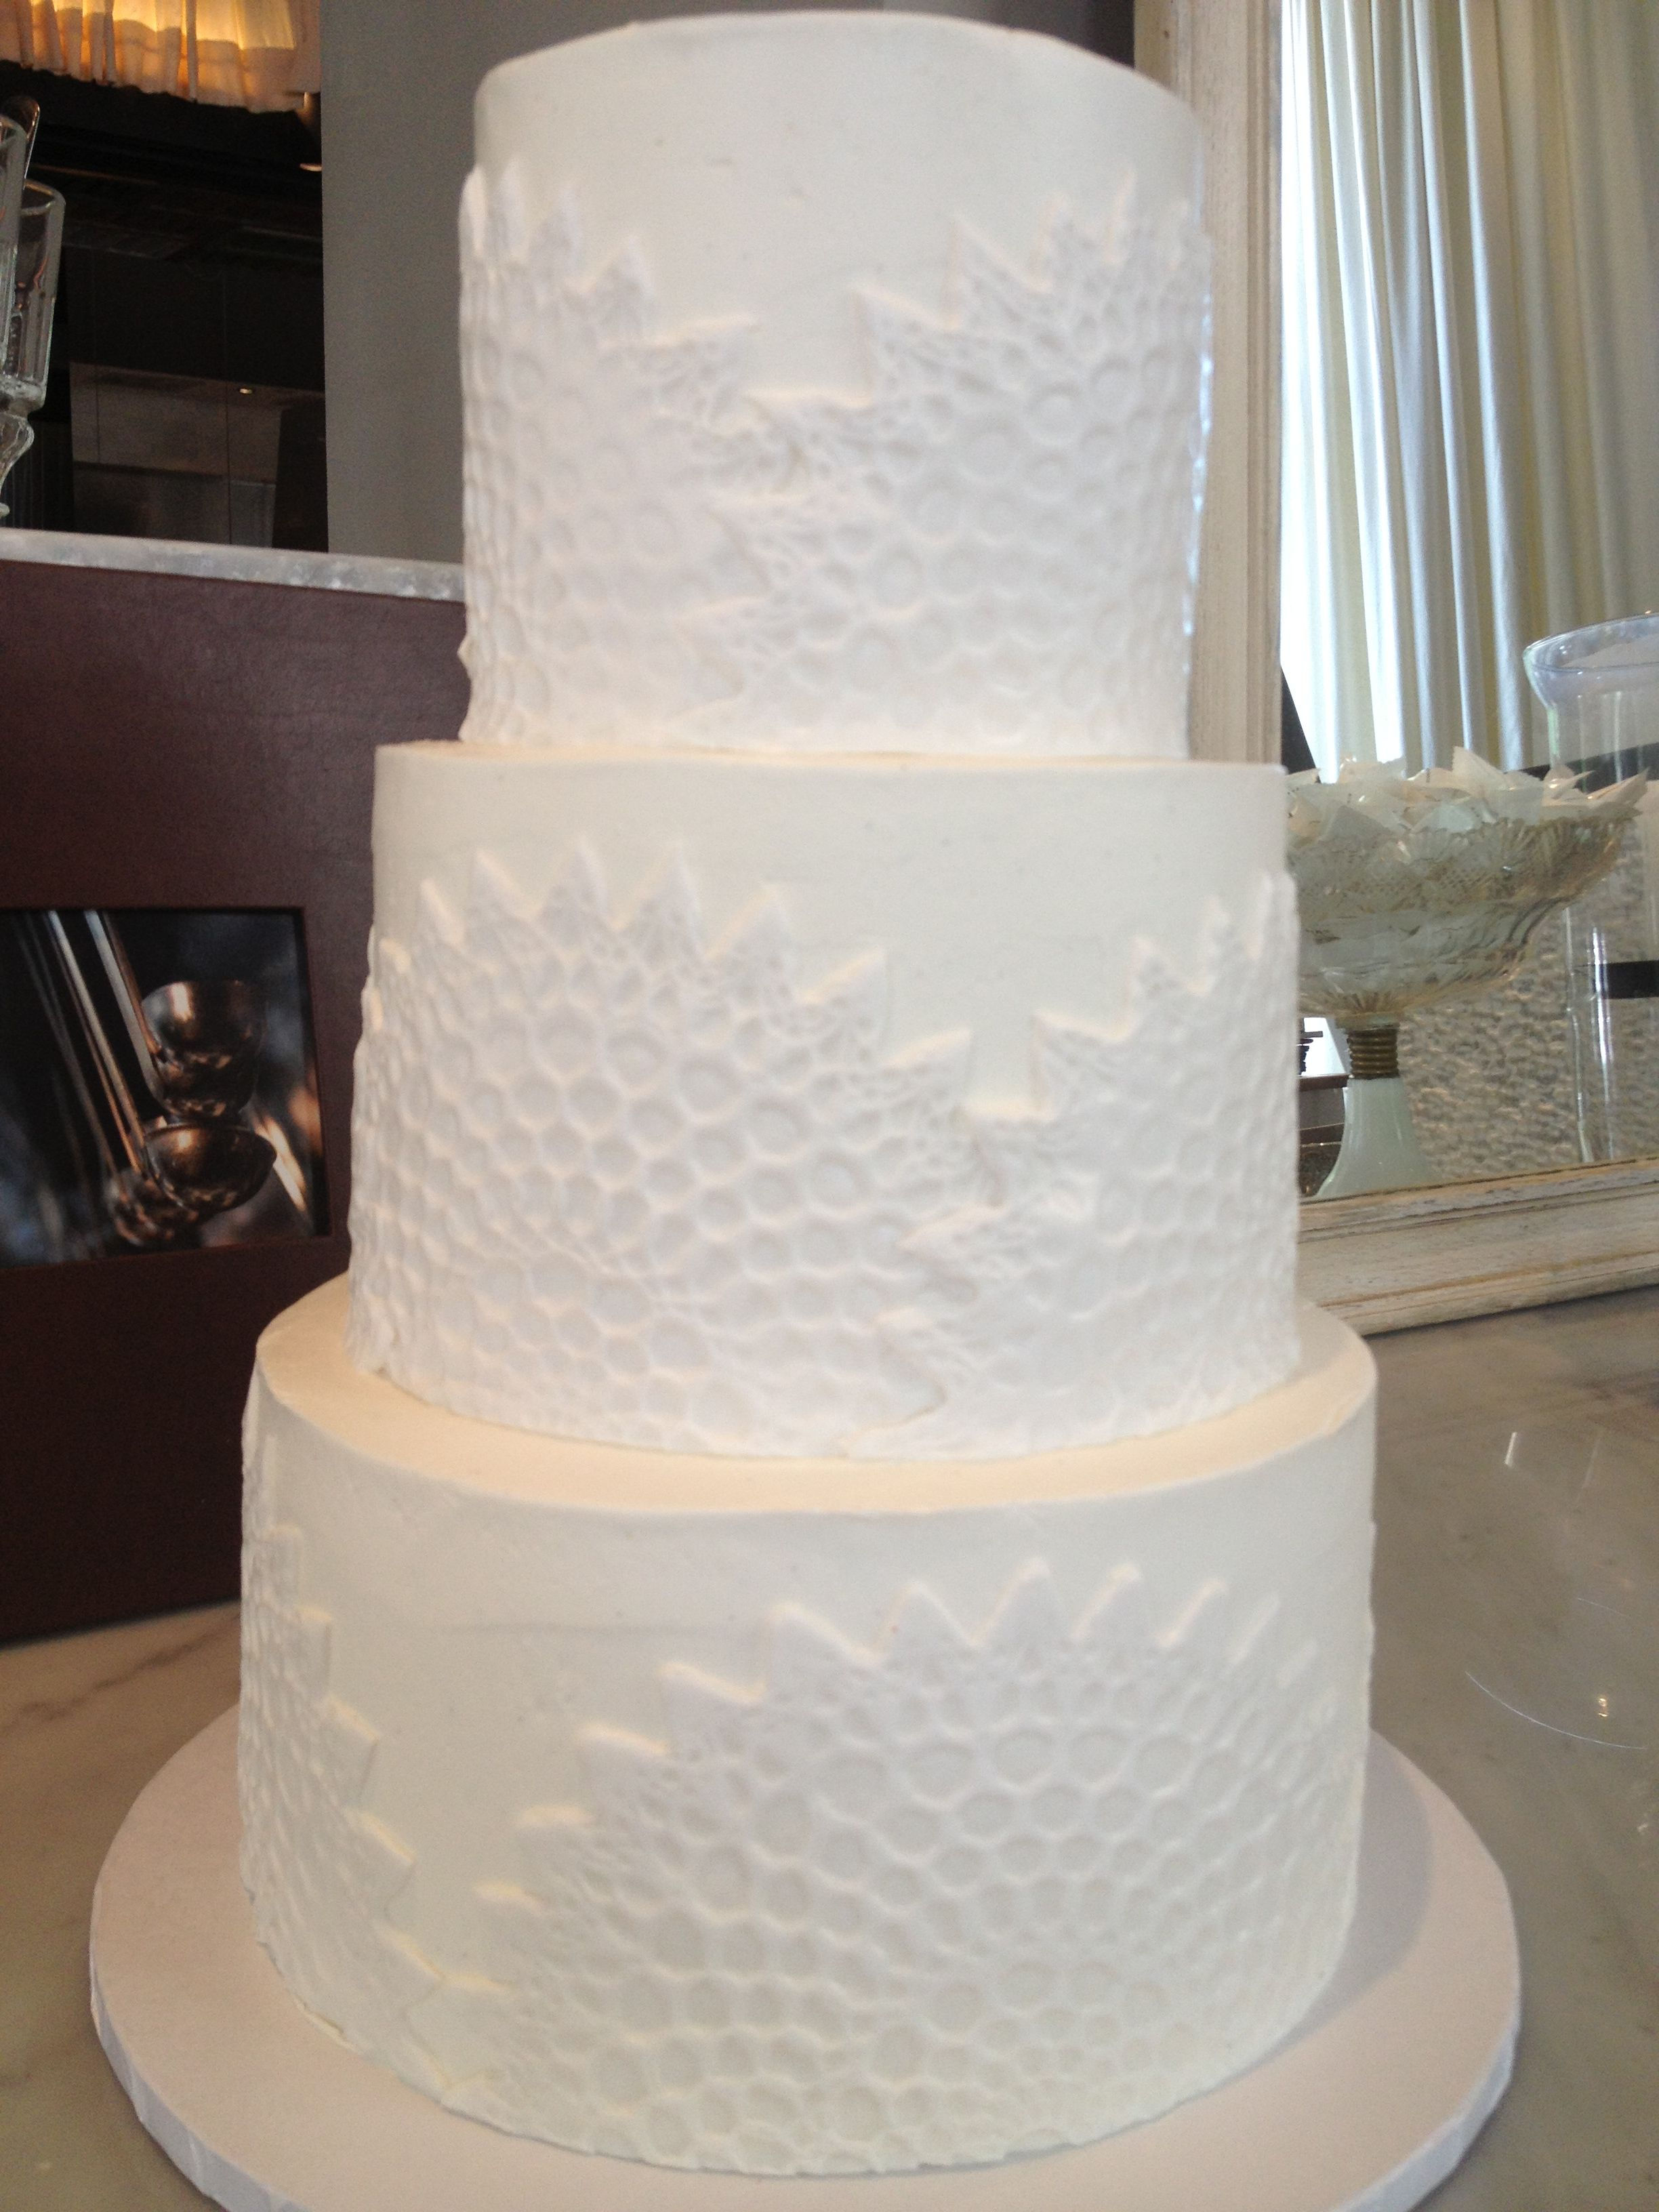 Cake With Fondant Lace : Buttercream cake with fondant lace doily applique. Lace ...